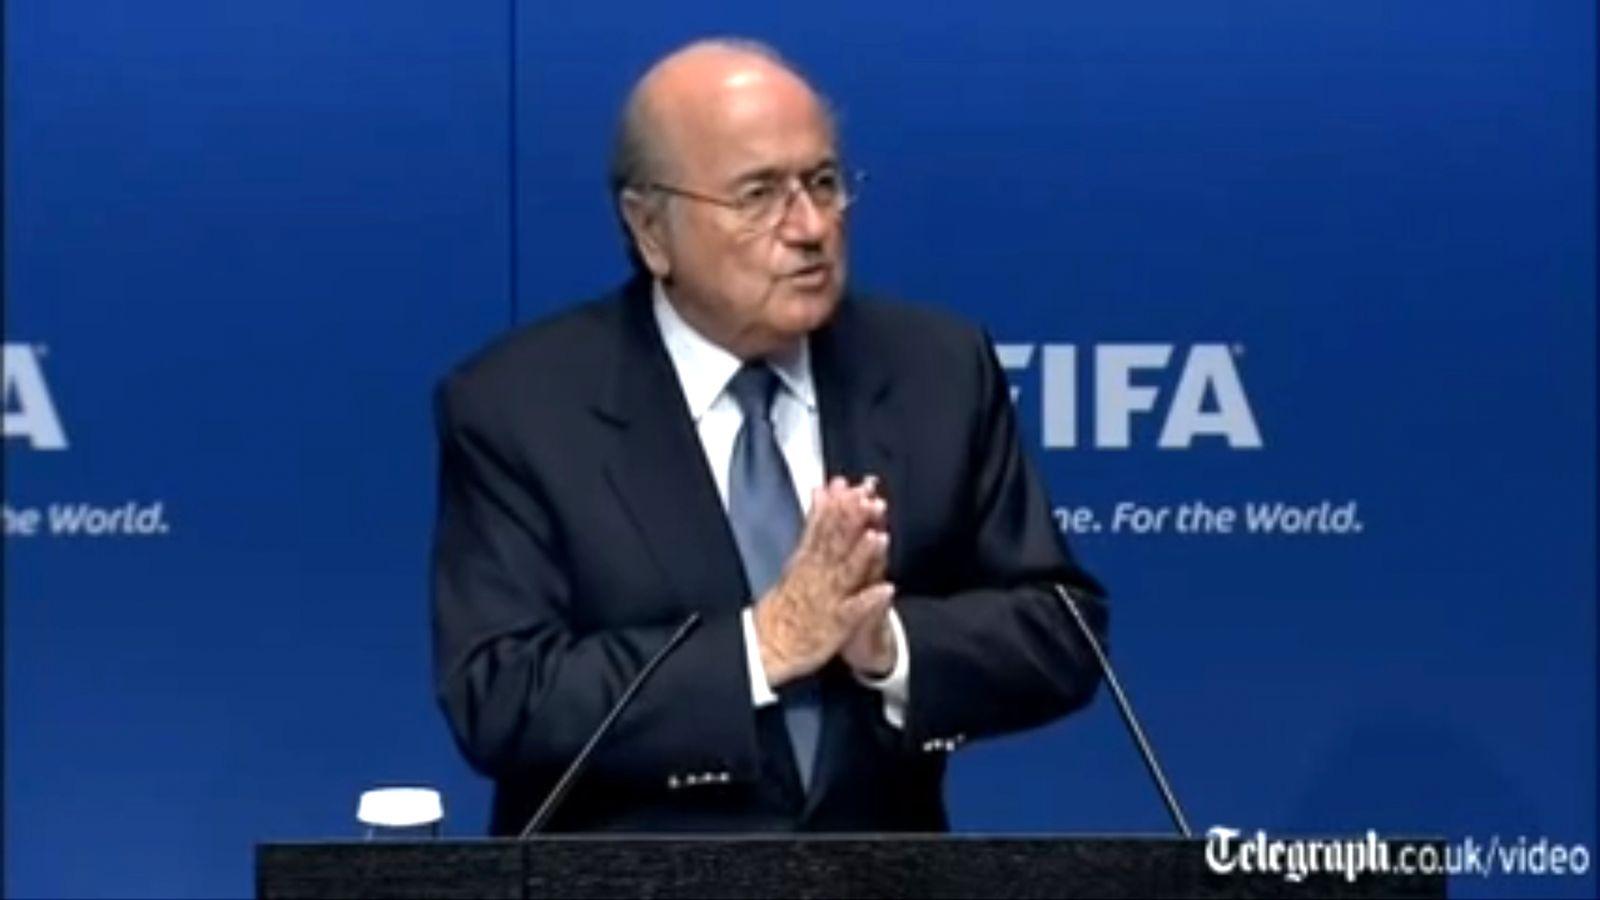 NUR ALS ZITAT Screenshot Sepp Blatter/ PK/ What crisis